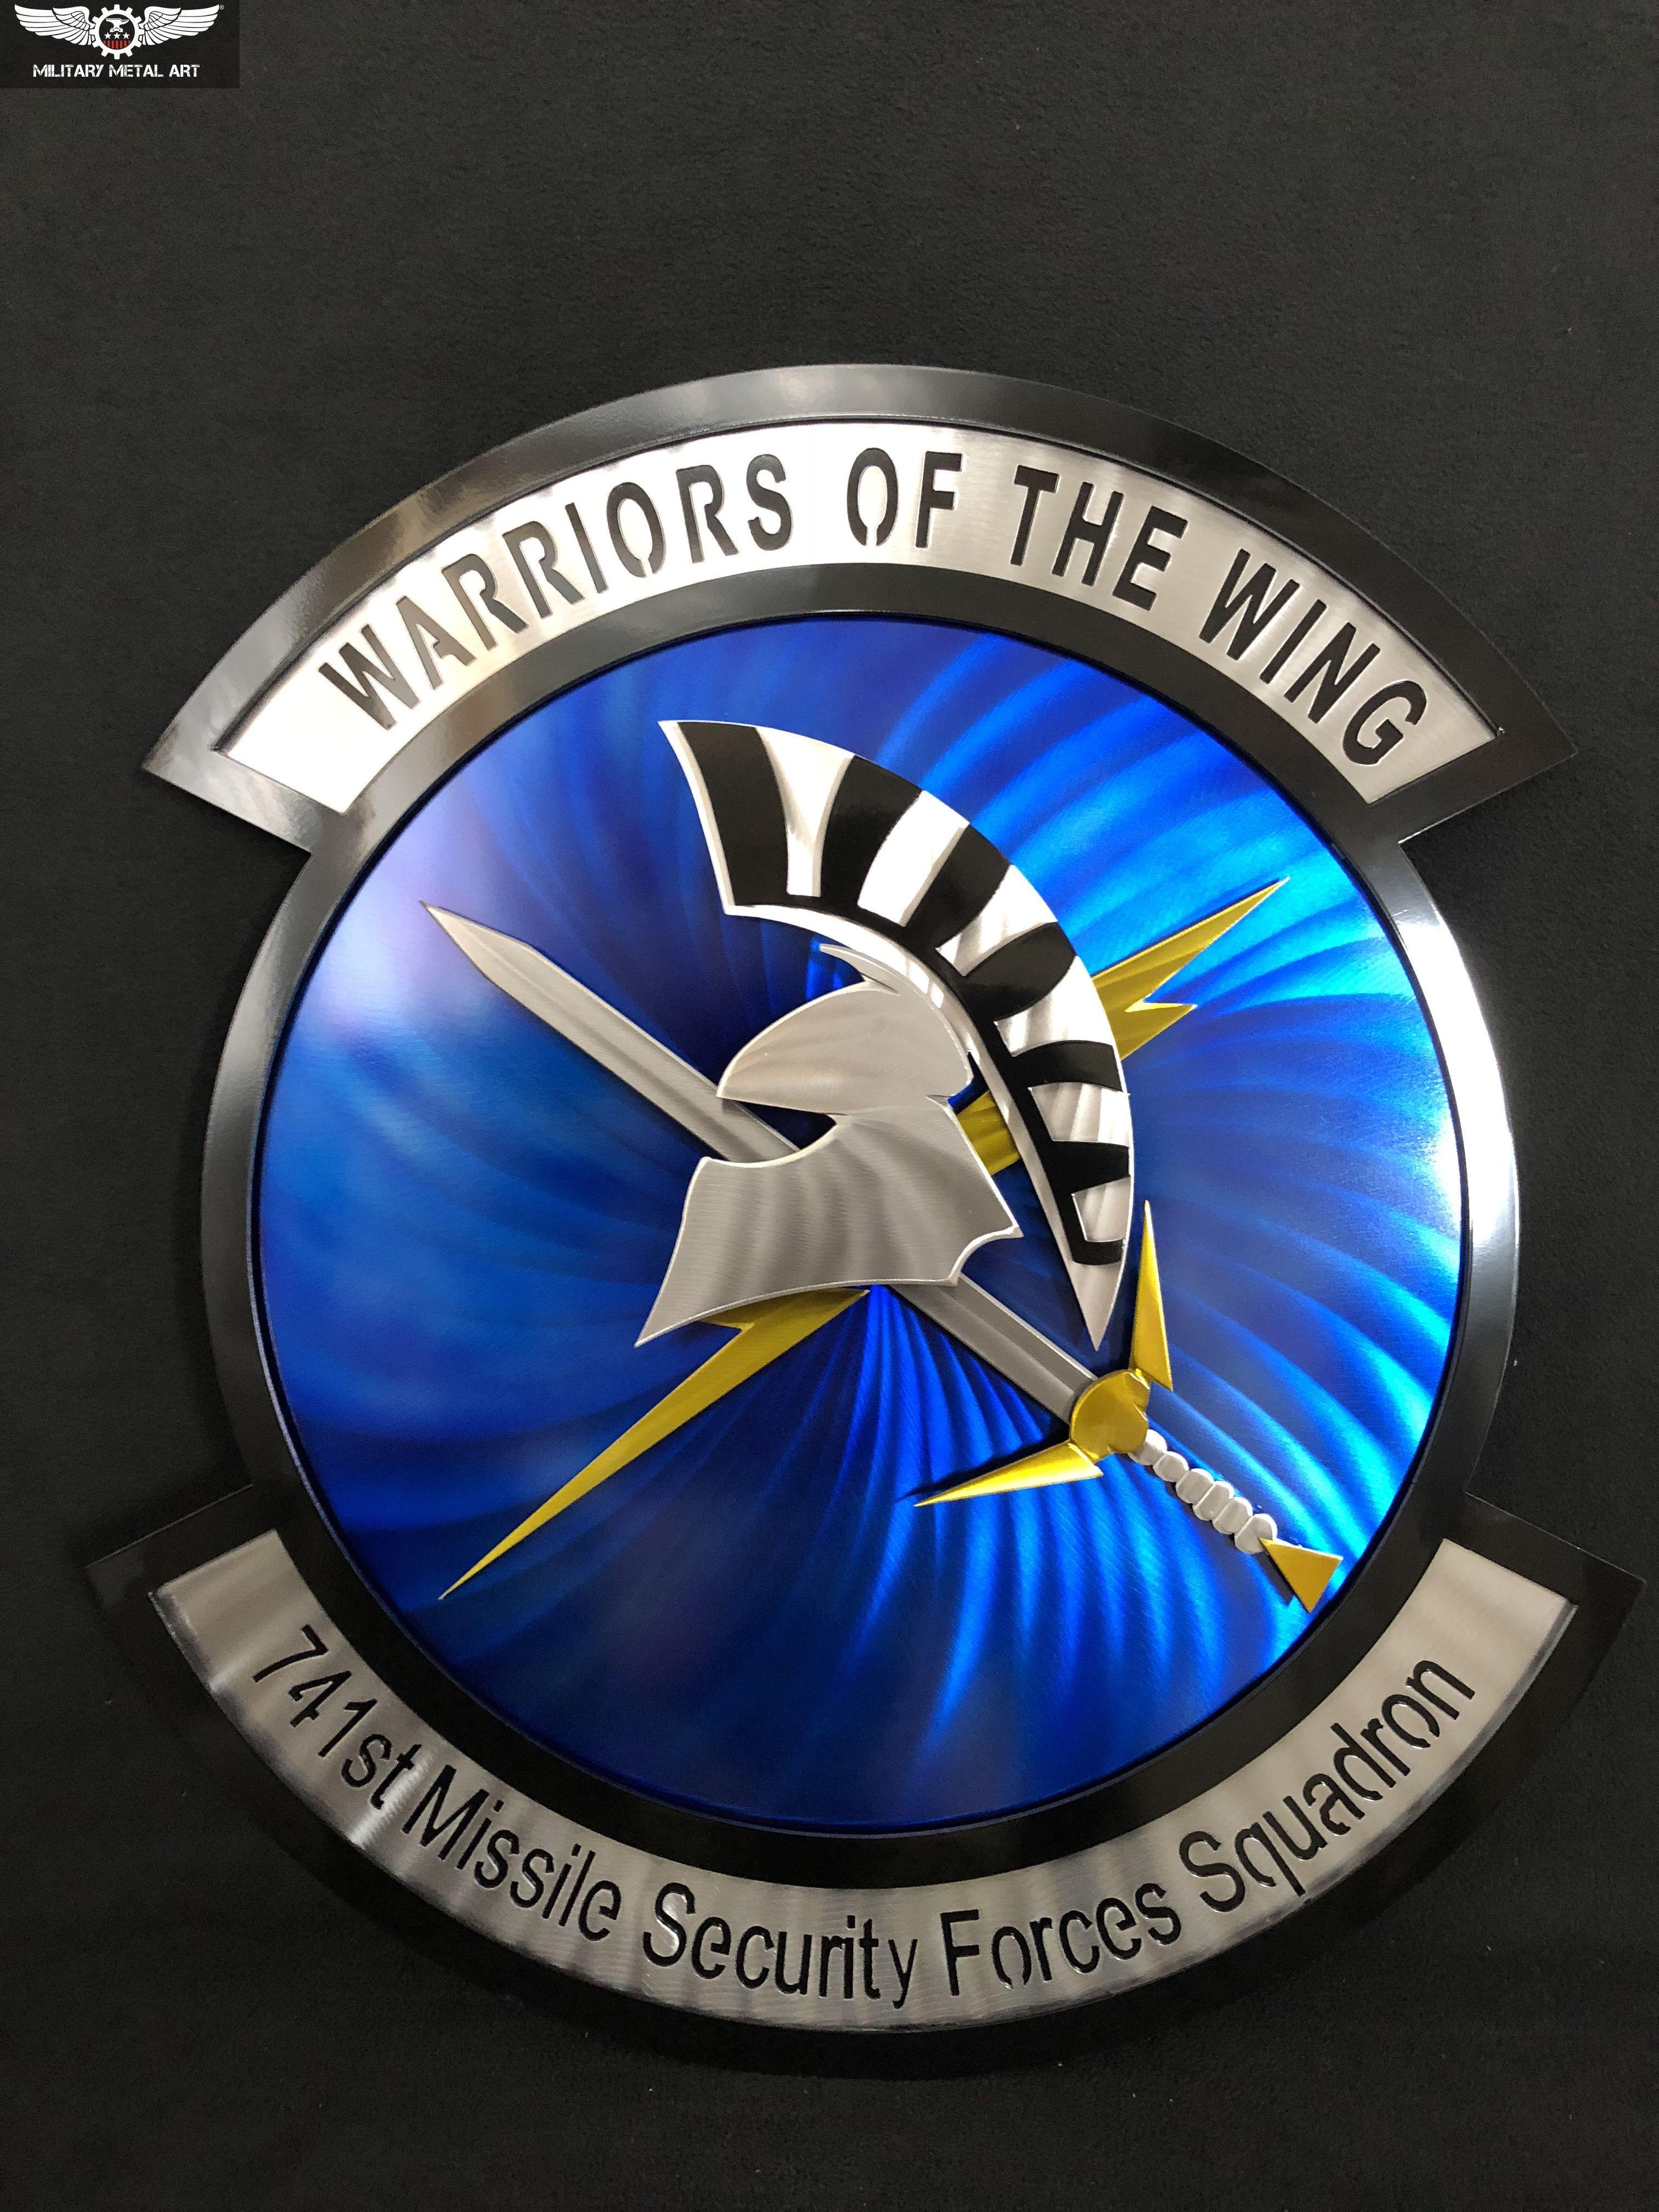 741st Missile Security Forces Squadron Metal Art Military Artwork Logo Design Creative